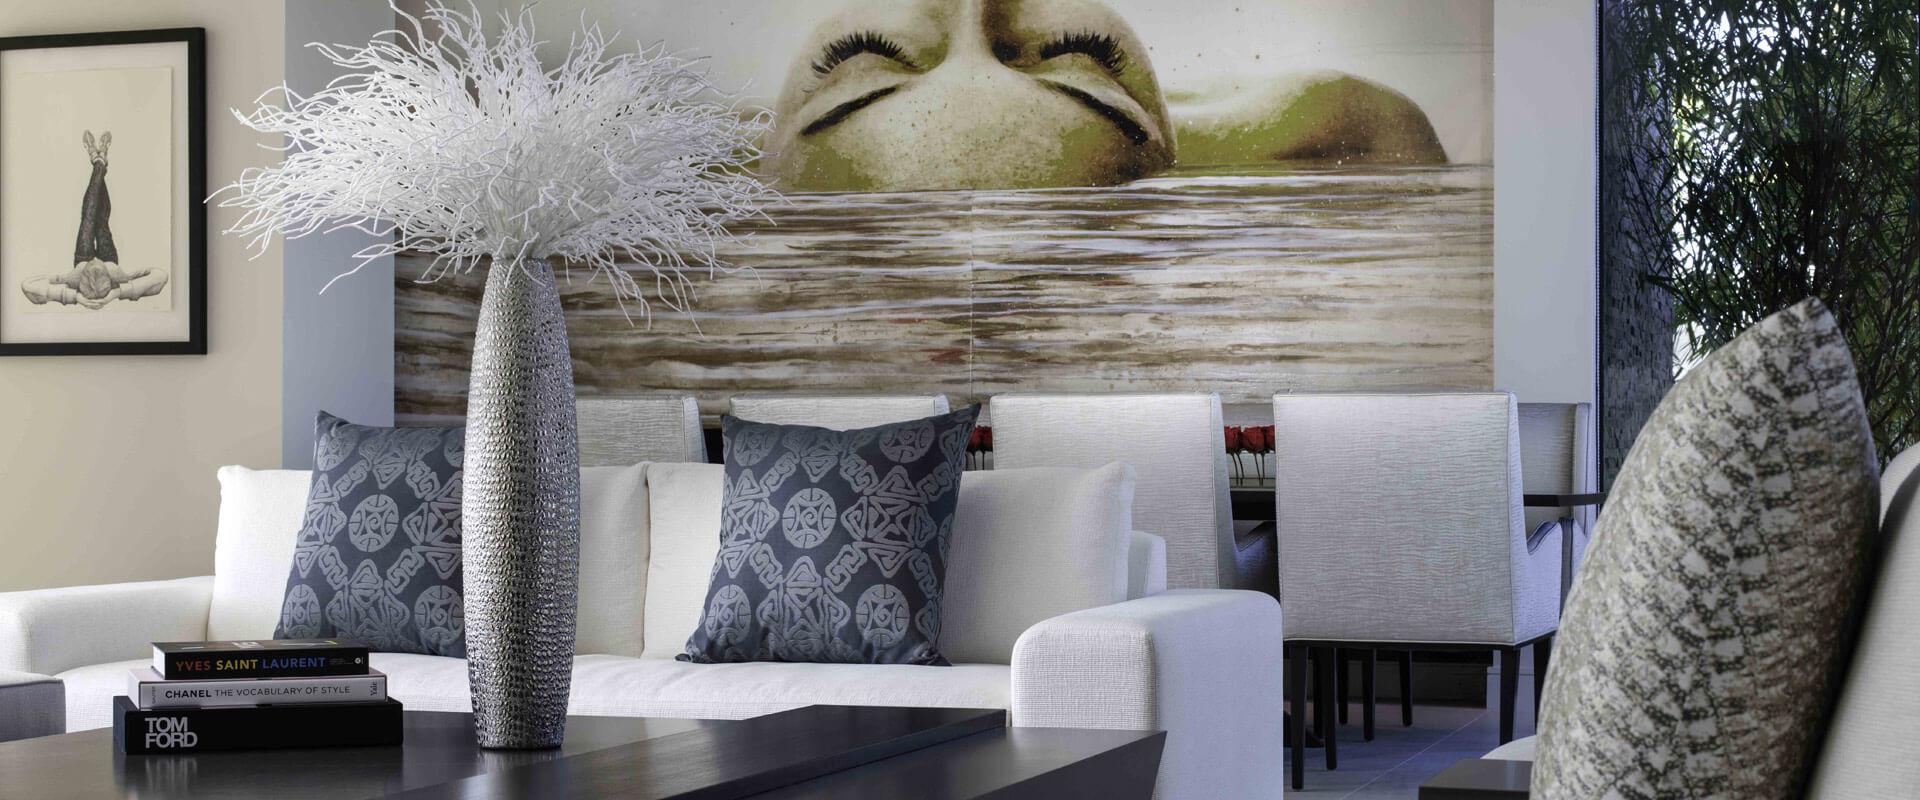 Interior Design Firm Crt Studio Winter Park Florida